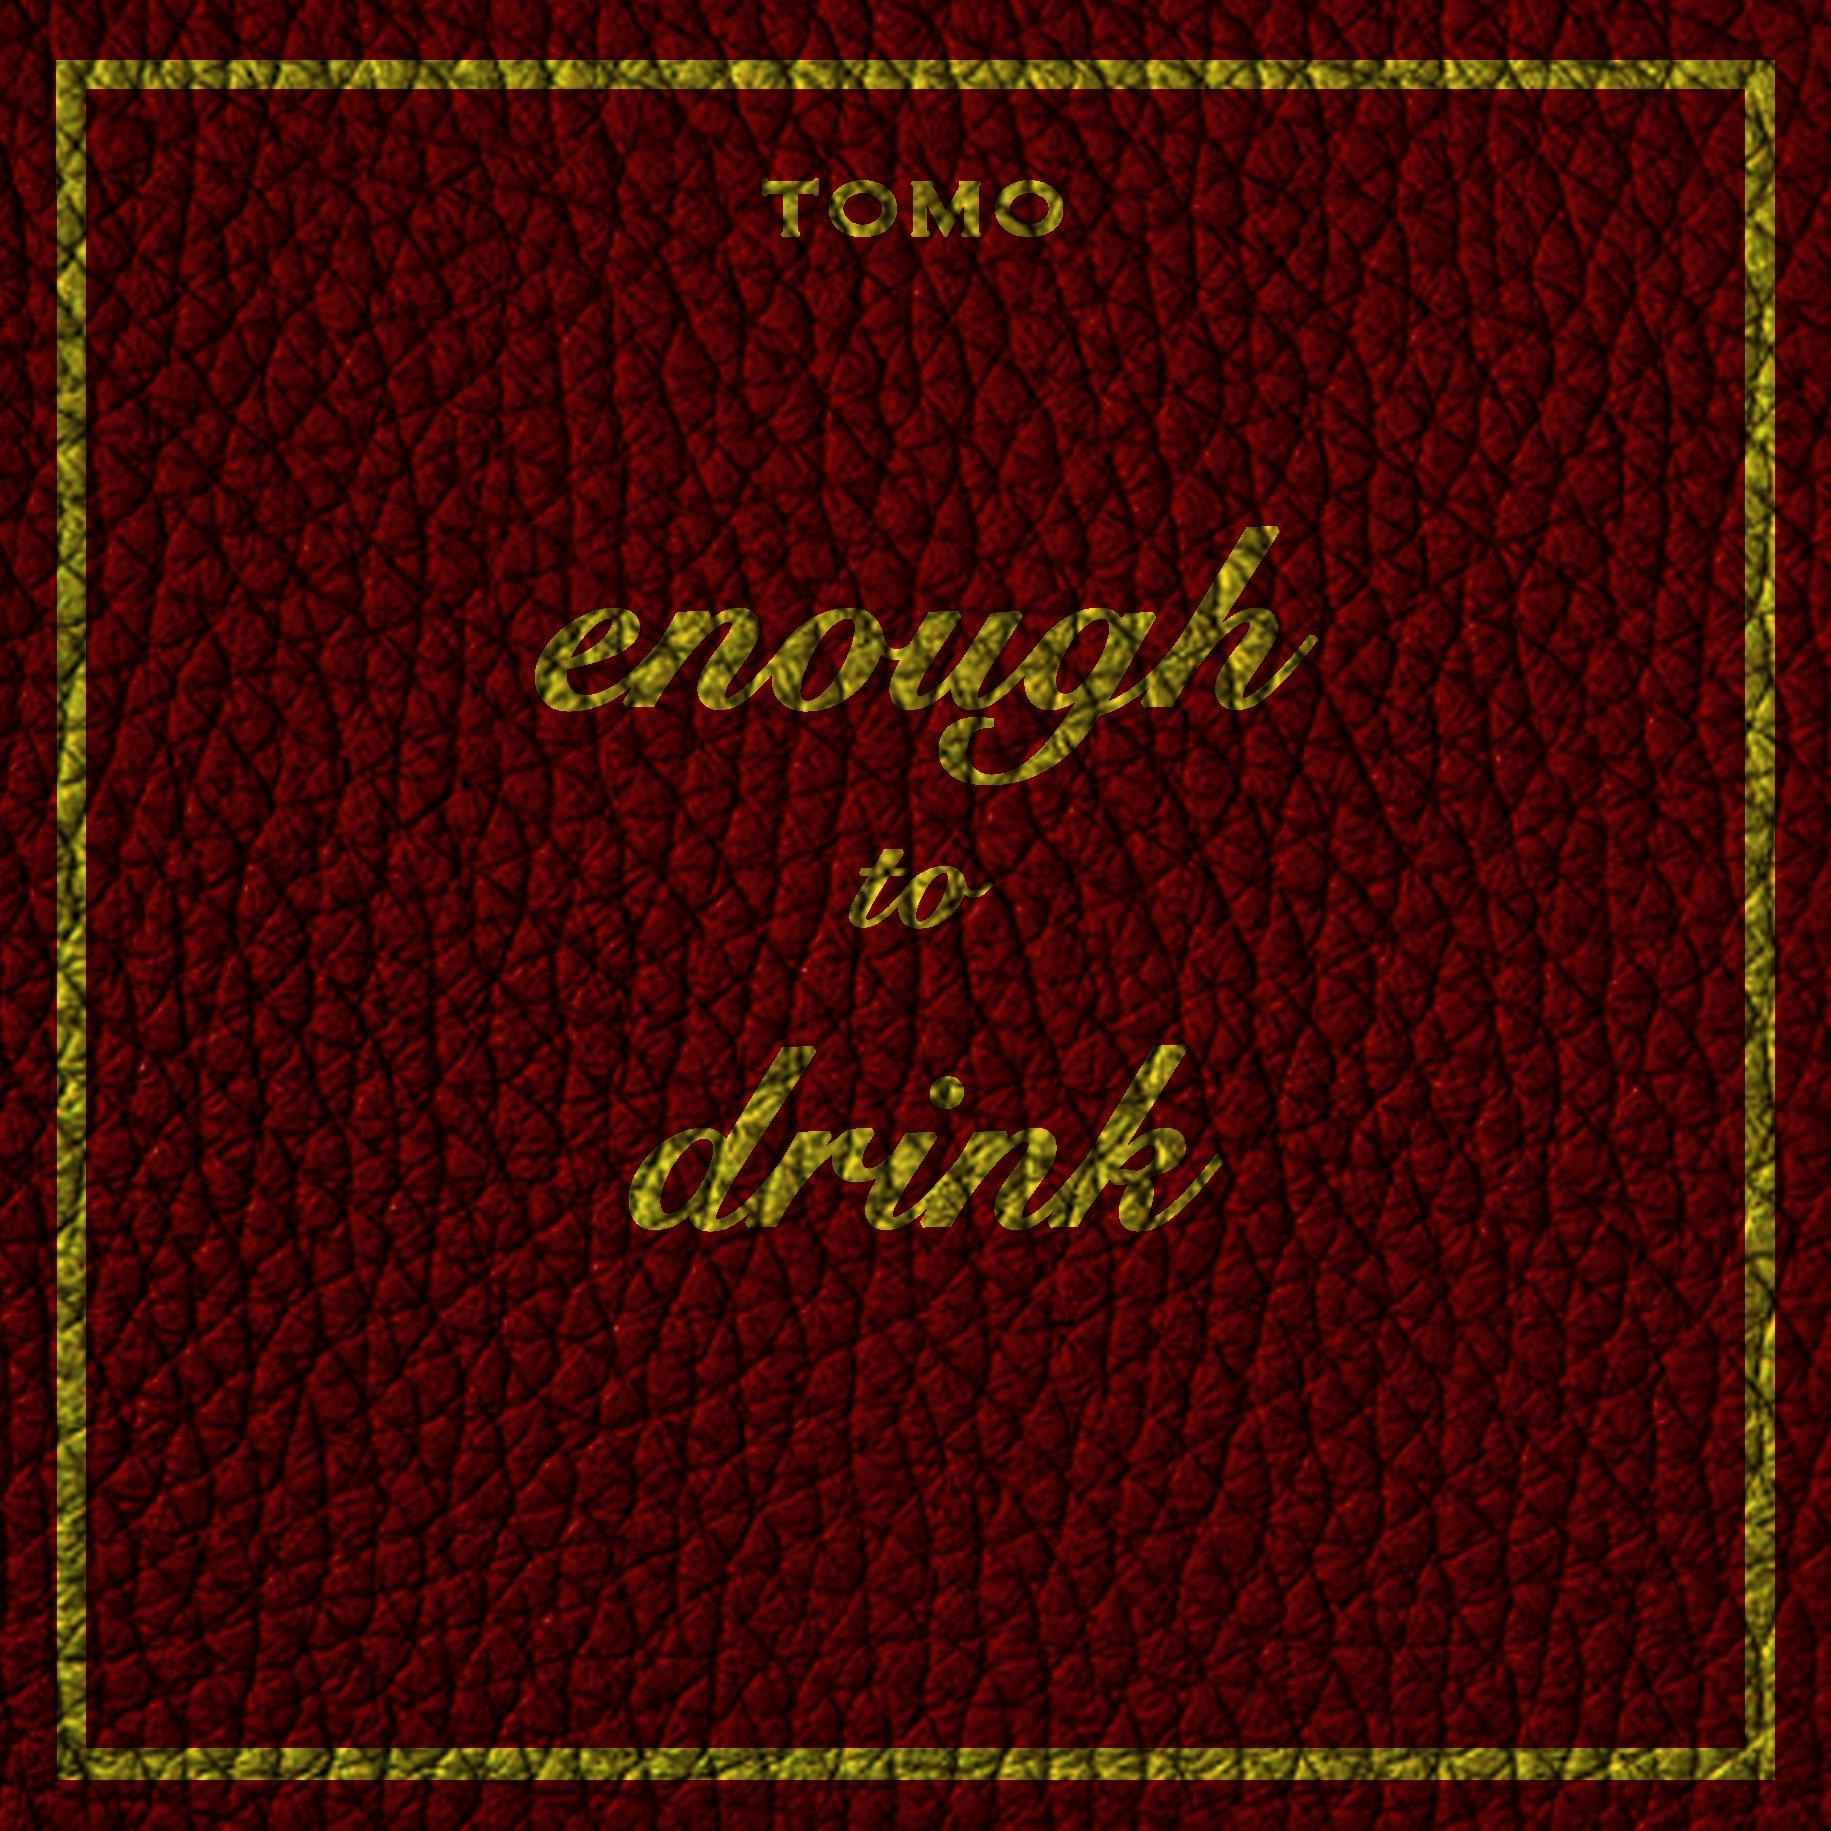 Tomo – Enough to Drink